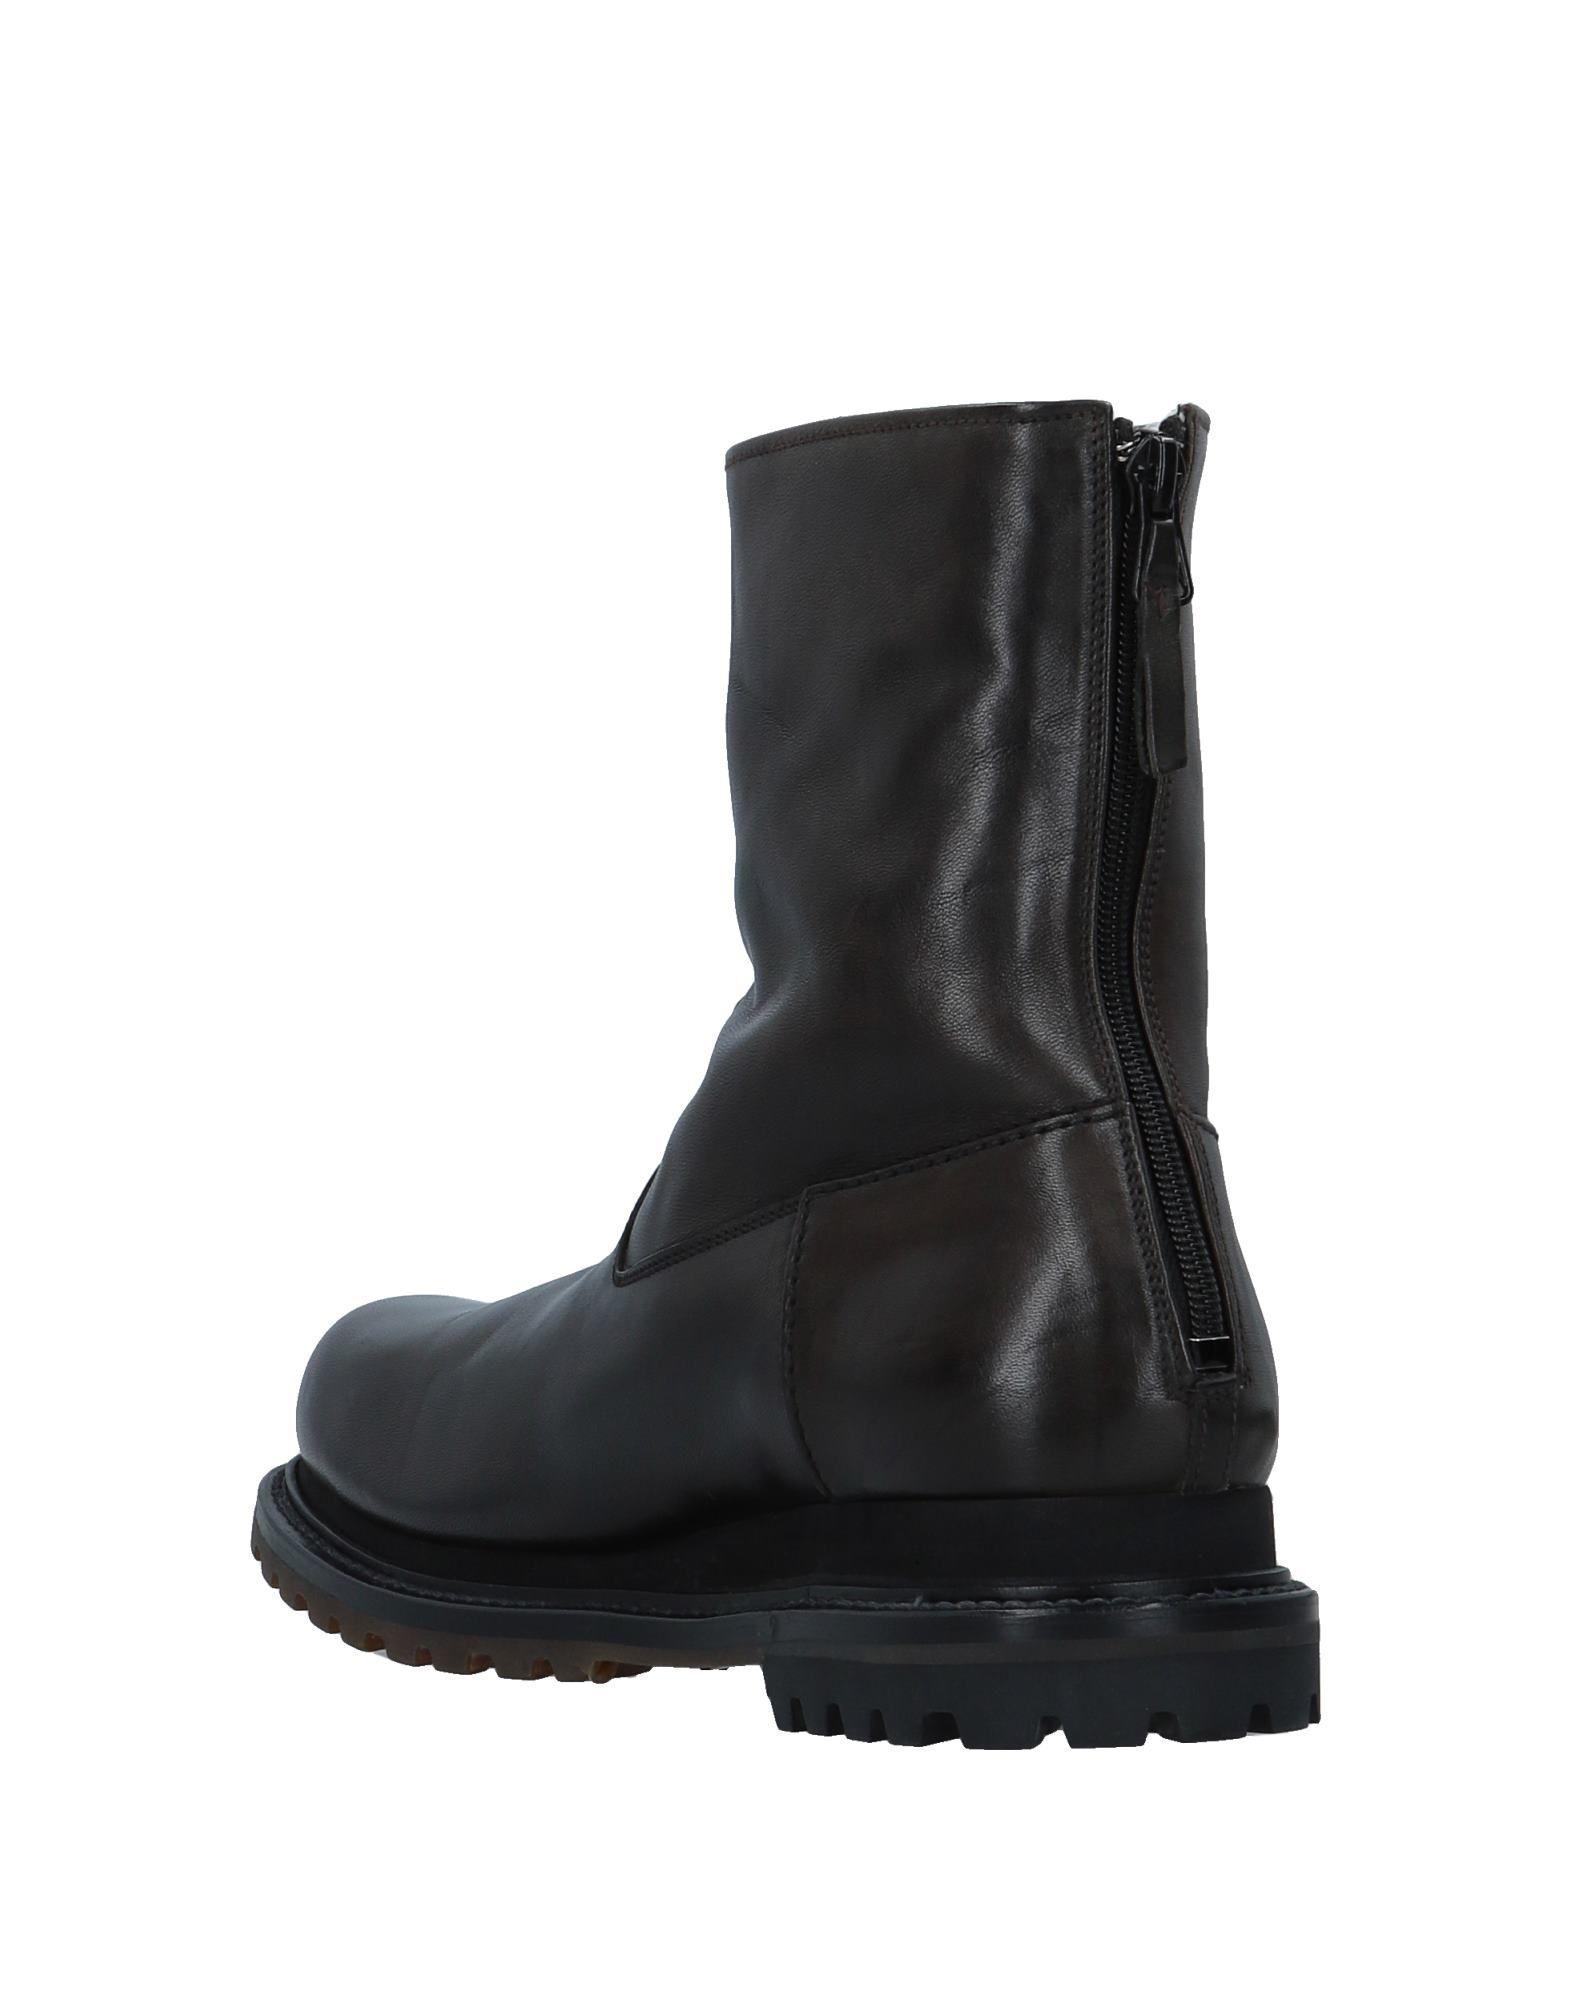 Premiata Stiefelette Herren  11528942XX Heiße Heiße Heiße Schuhe 036e76